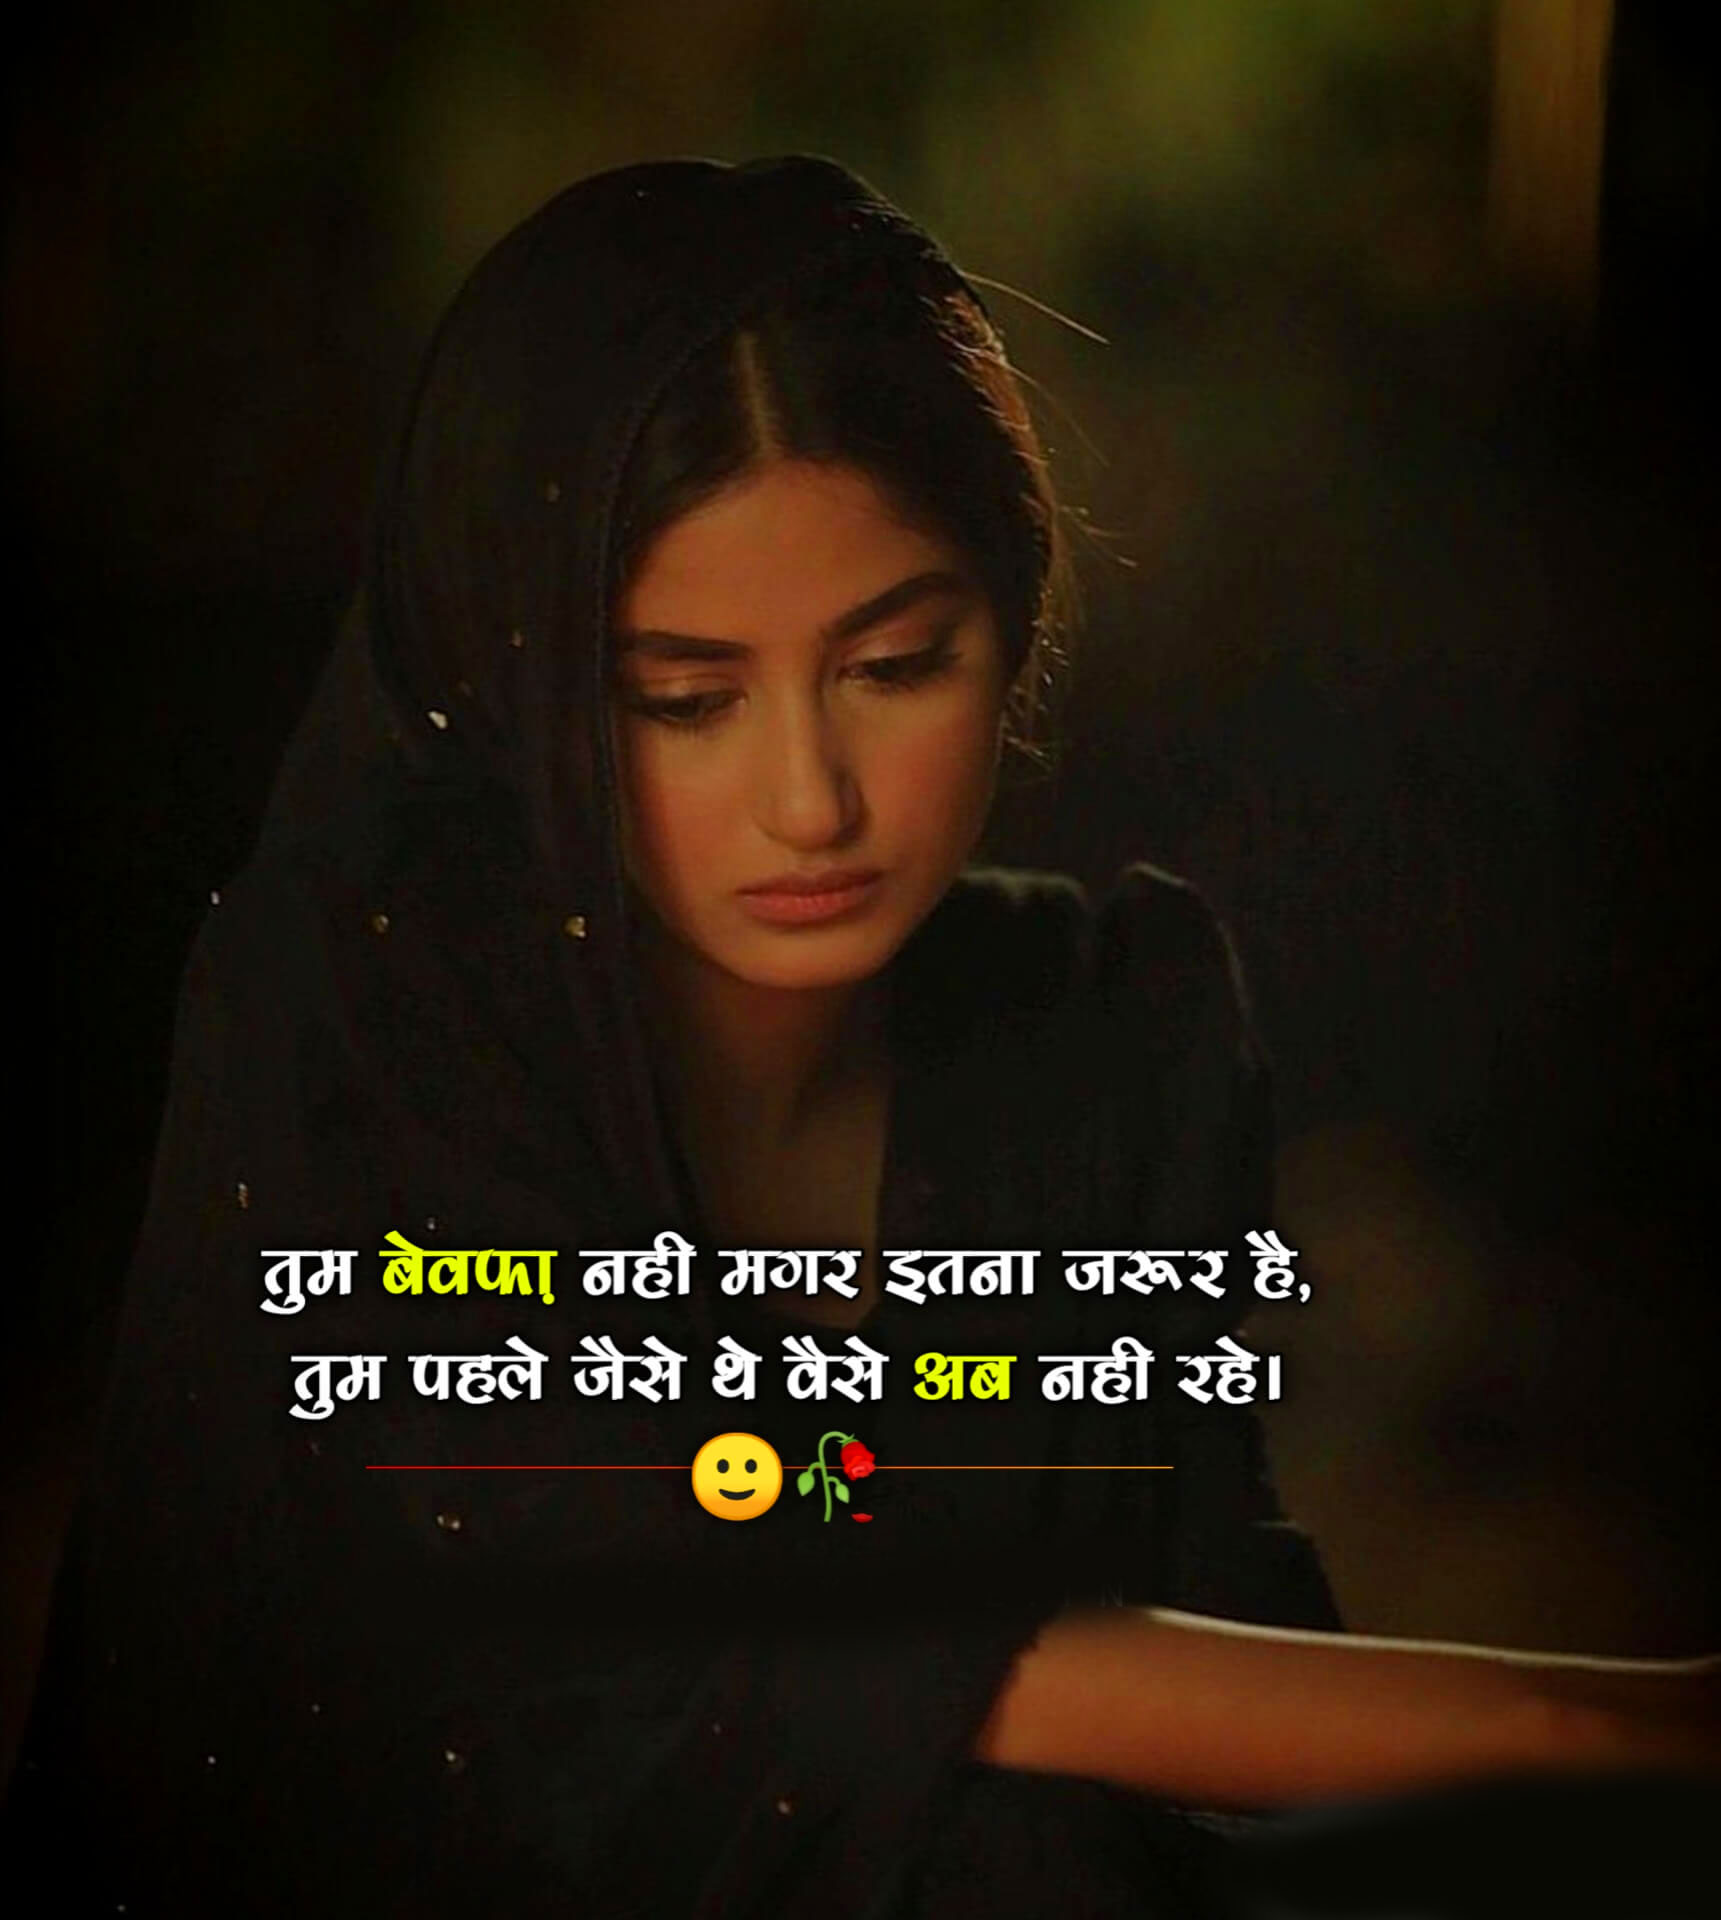 Rone Wala Whatsapp Dp Pics HD